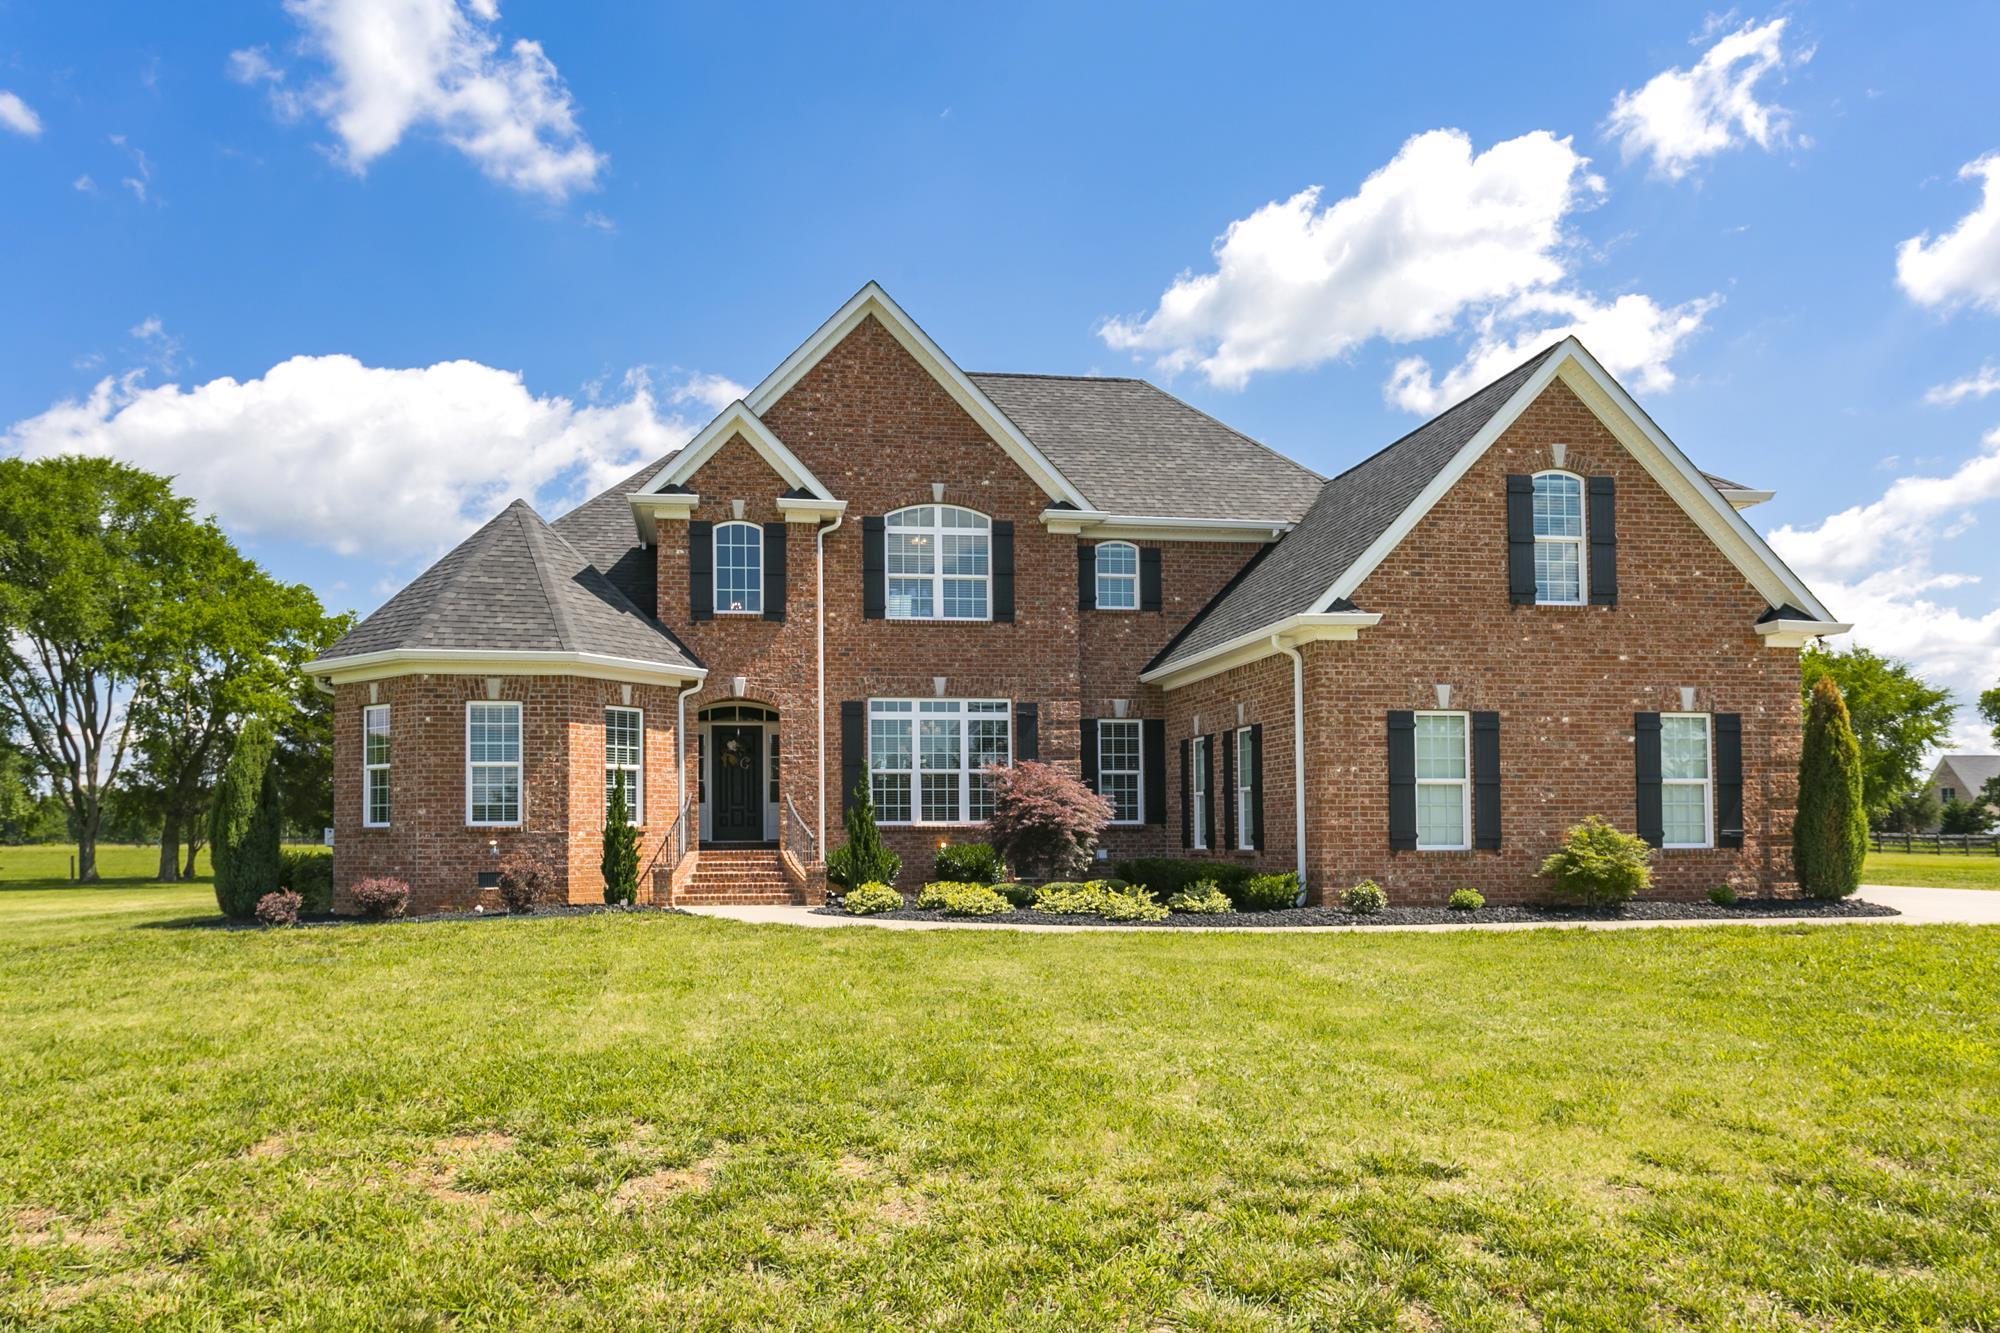 3845 Triple Crown Dr, Murfreesboro, TN 37127 - Murfreesboro, TN real estate listing